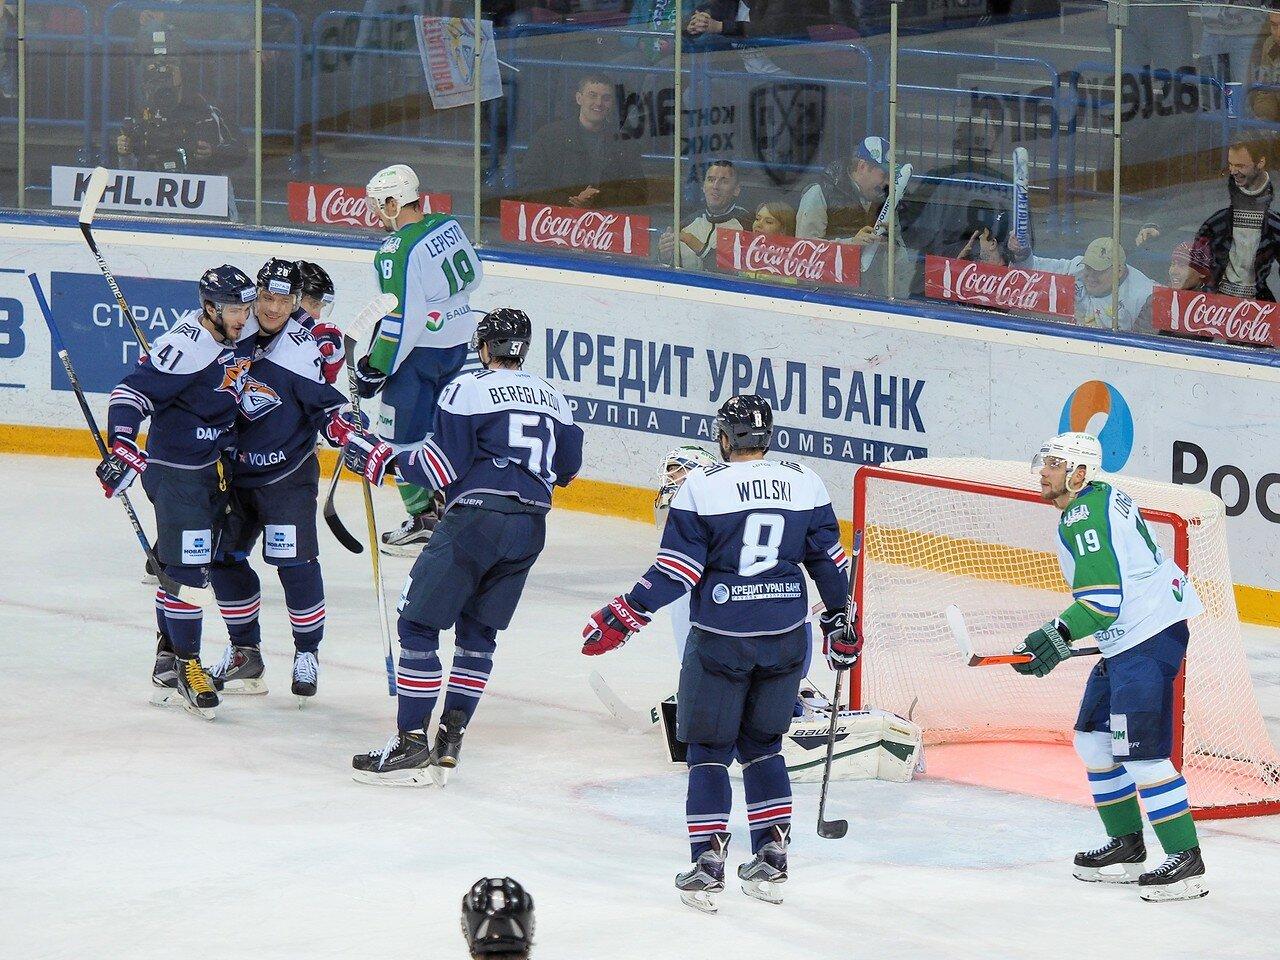 26Плей-офф 2016 Восток Финал Металлург - Салават Юлаев 25.03.2016